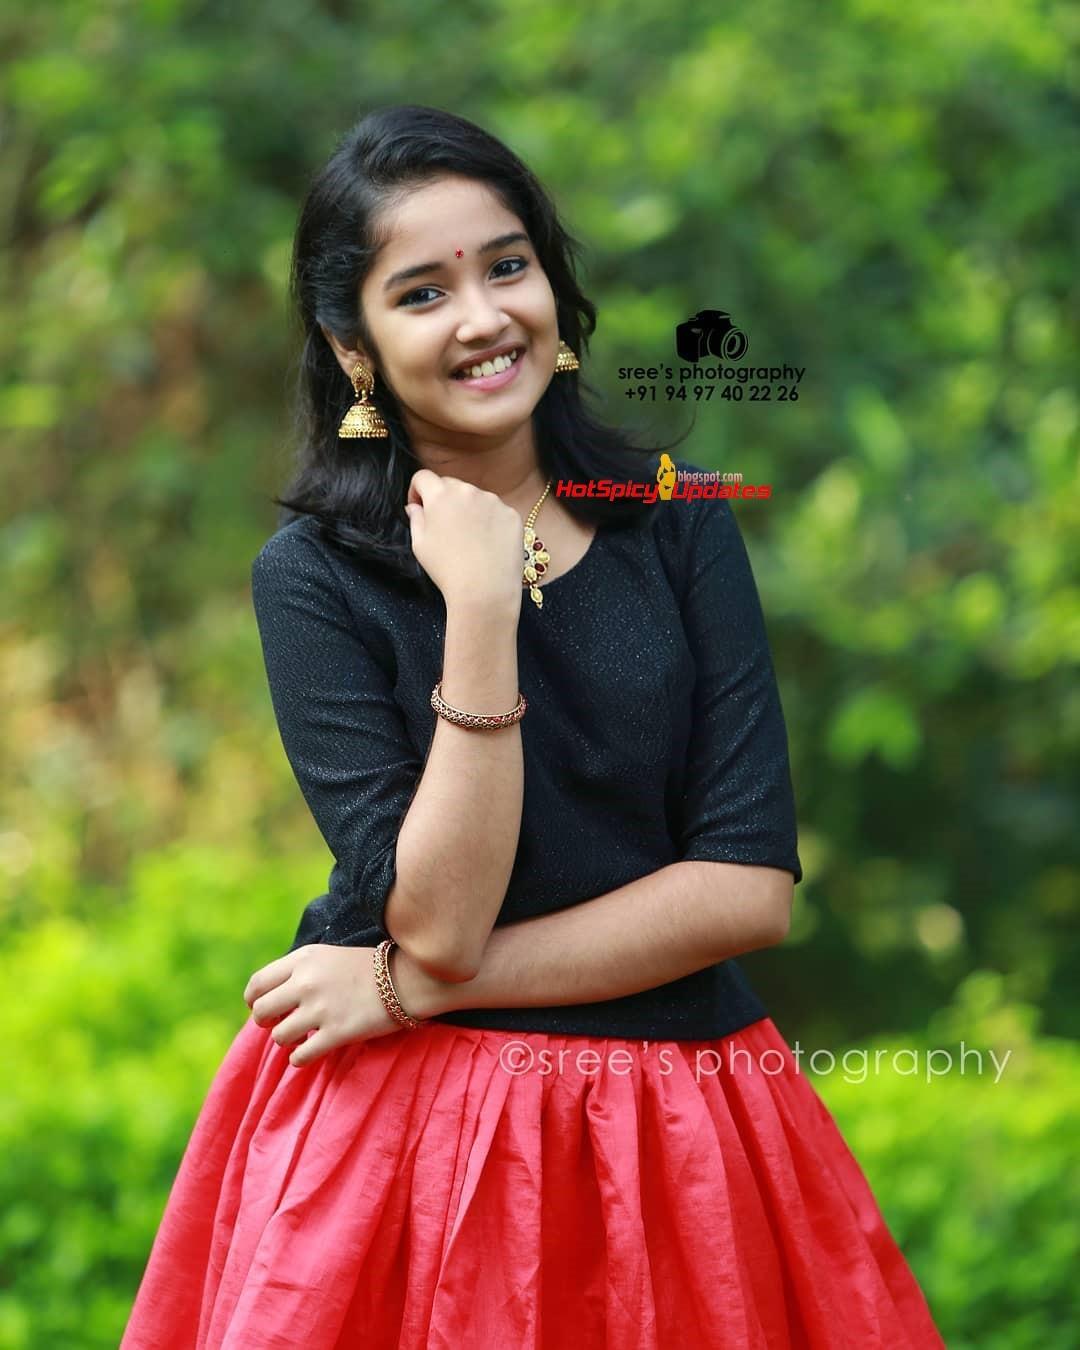 Anikha Surendran Aka Baby Anikha Cute And Stylish Photo -3876